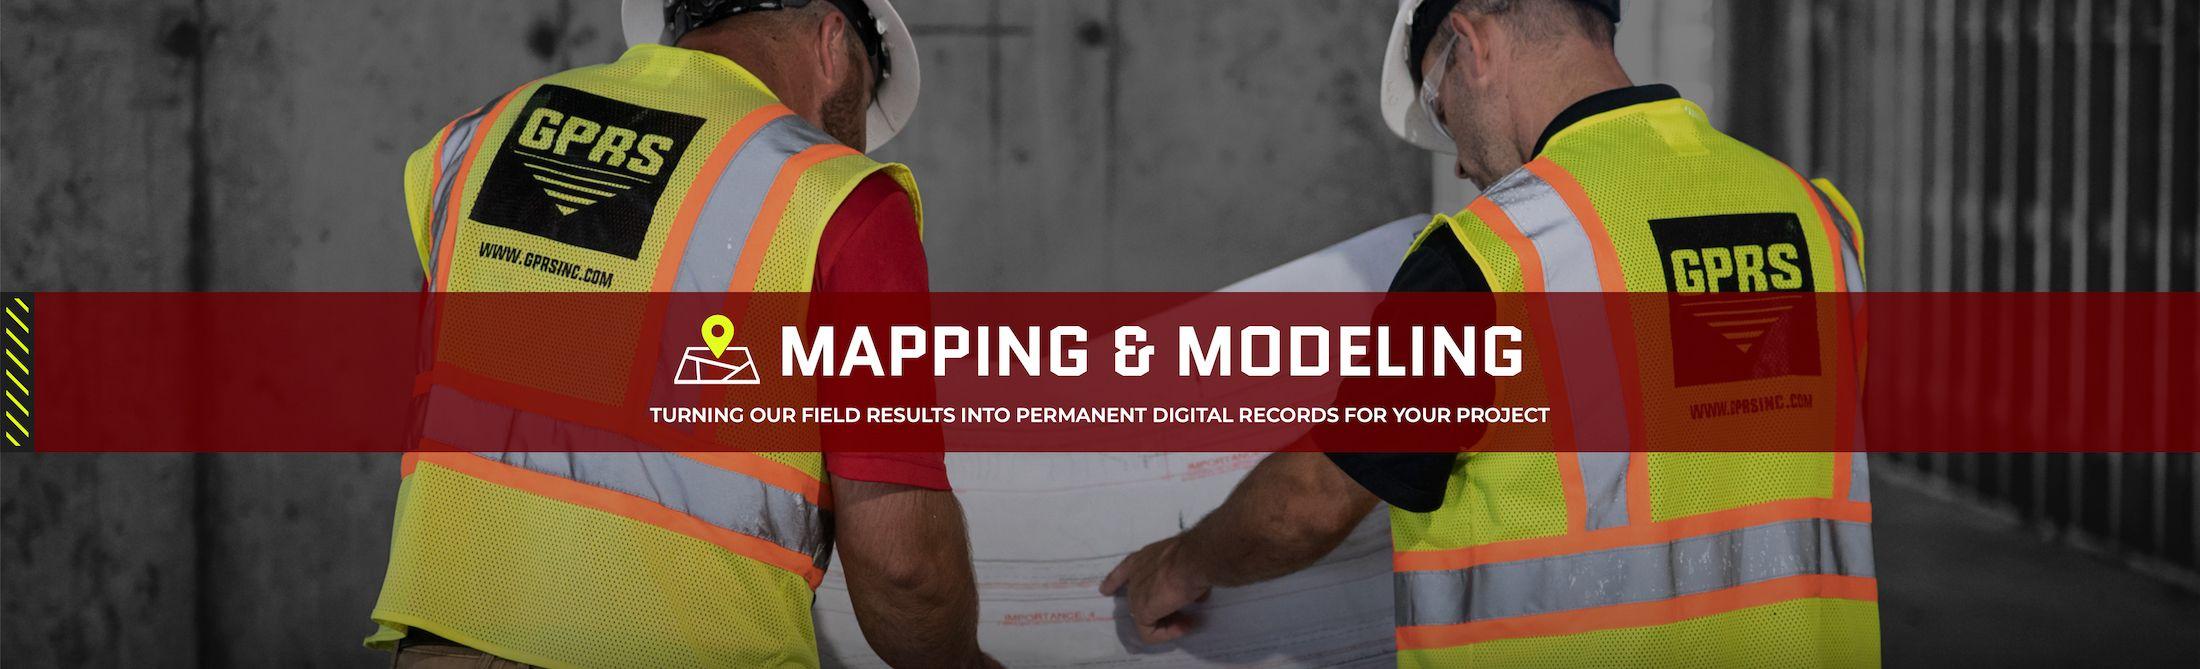 mapping-modeling.jpg